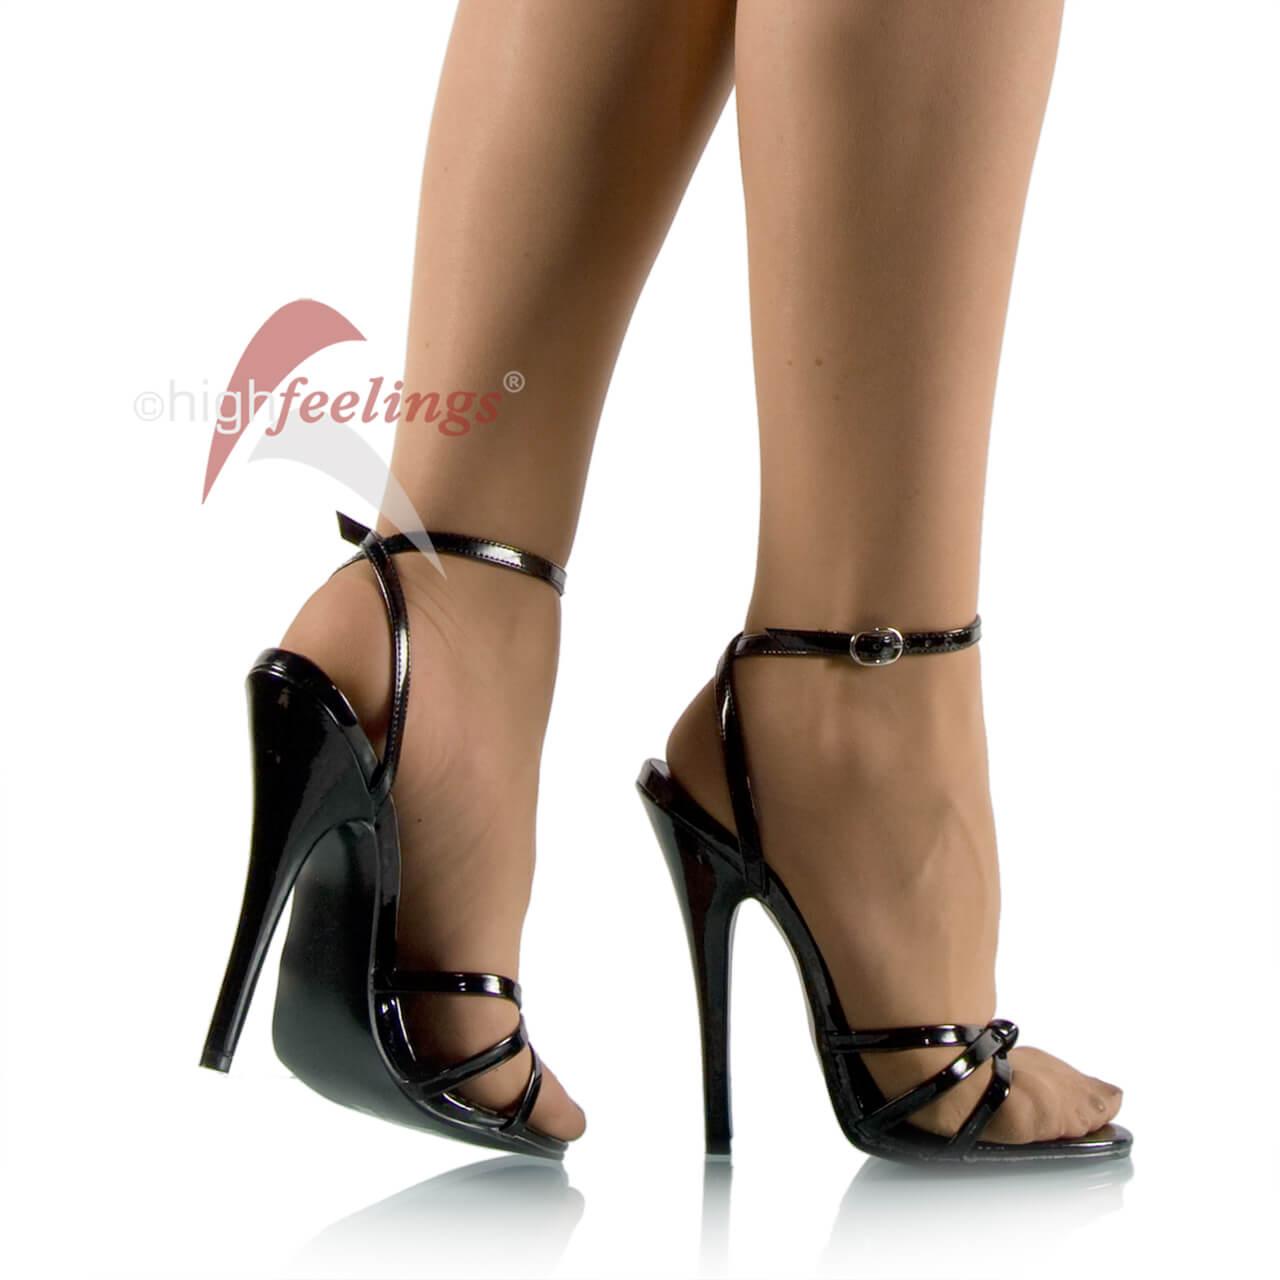 zu große high heels